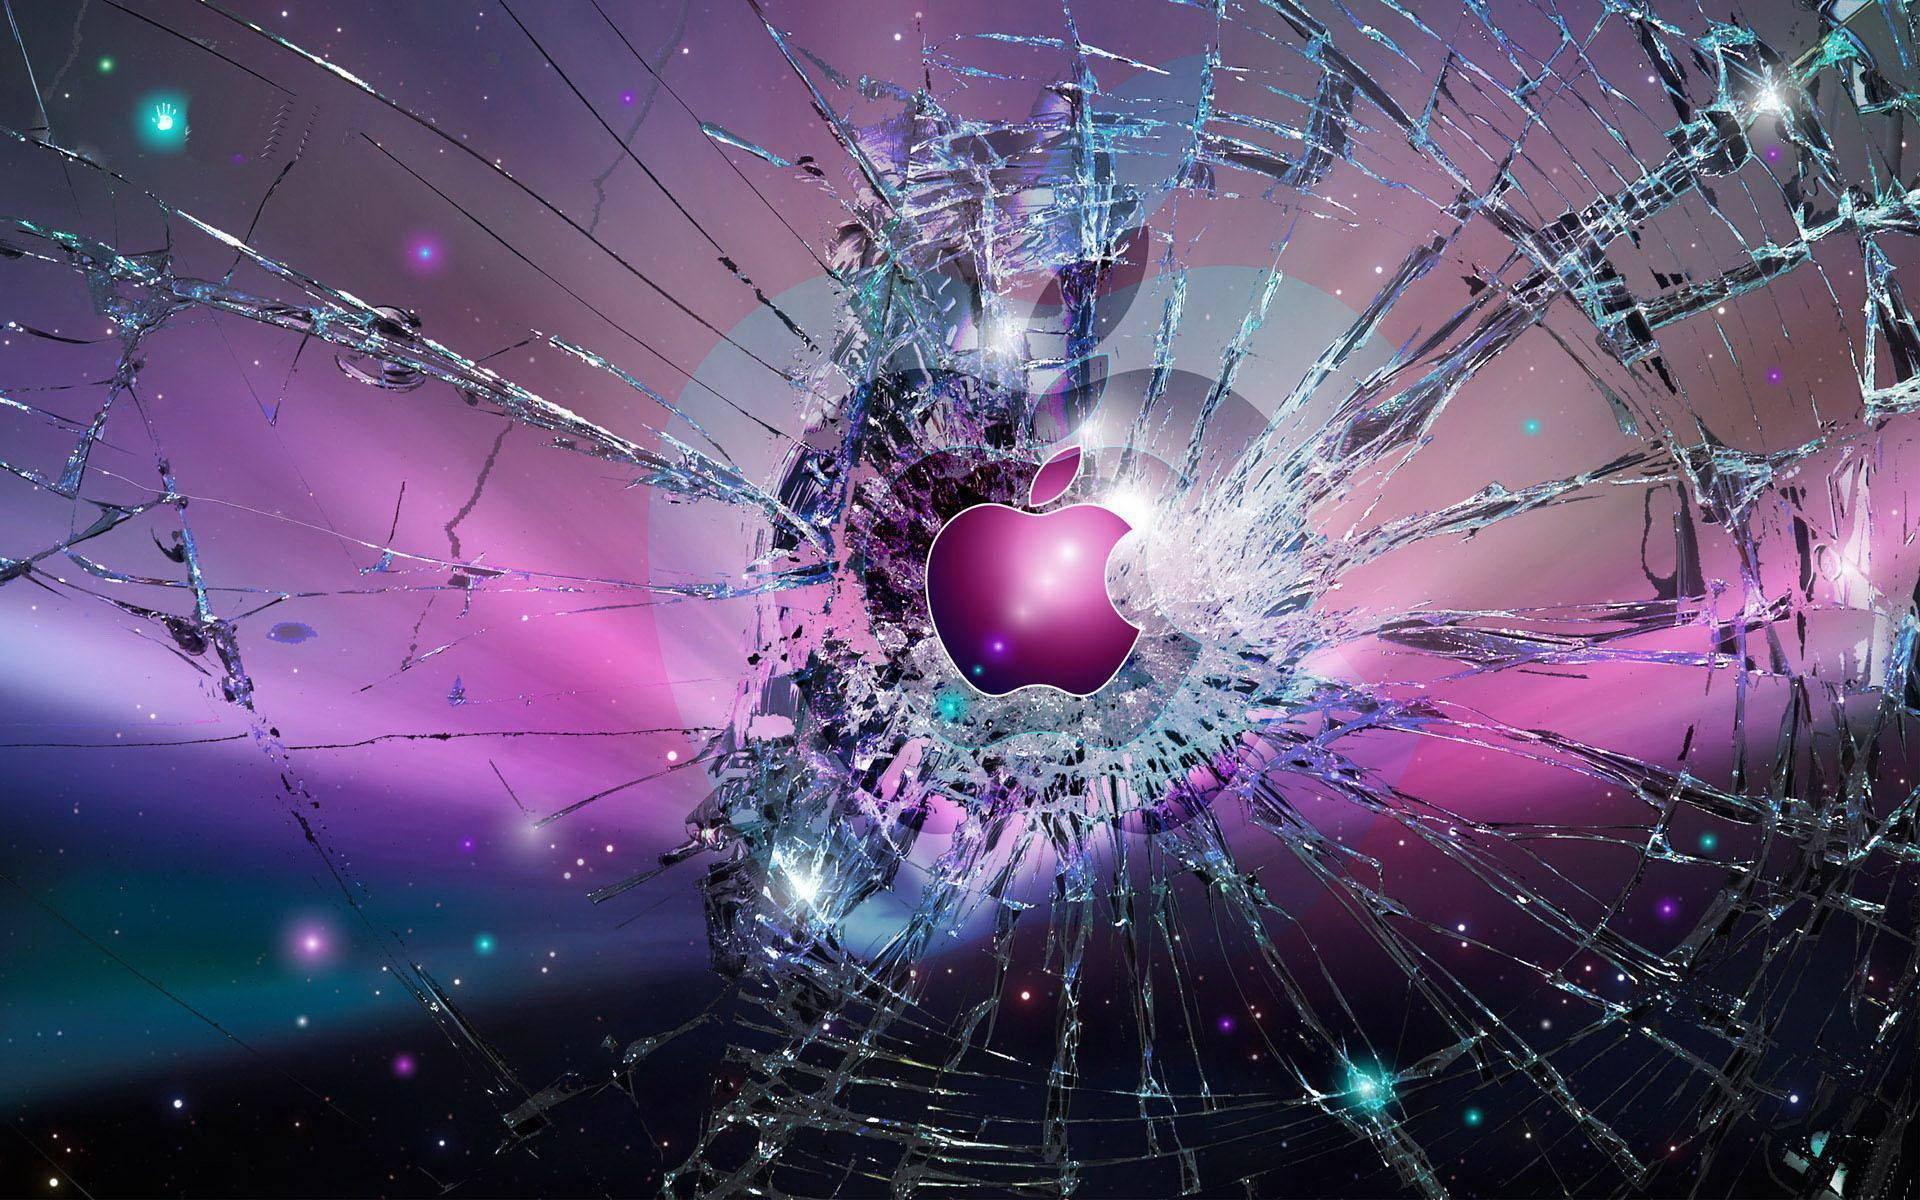 apple-apple-crash-window قصة أزمة أسهم آبل و سقوطها من عرش الأكثر قيمة في العالم